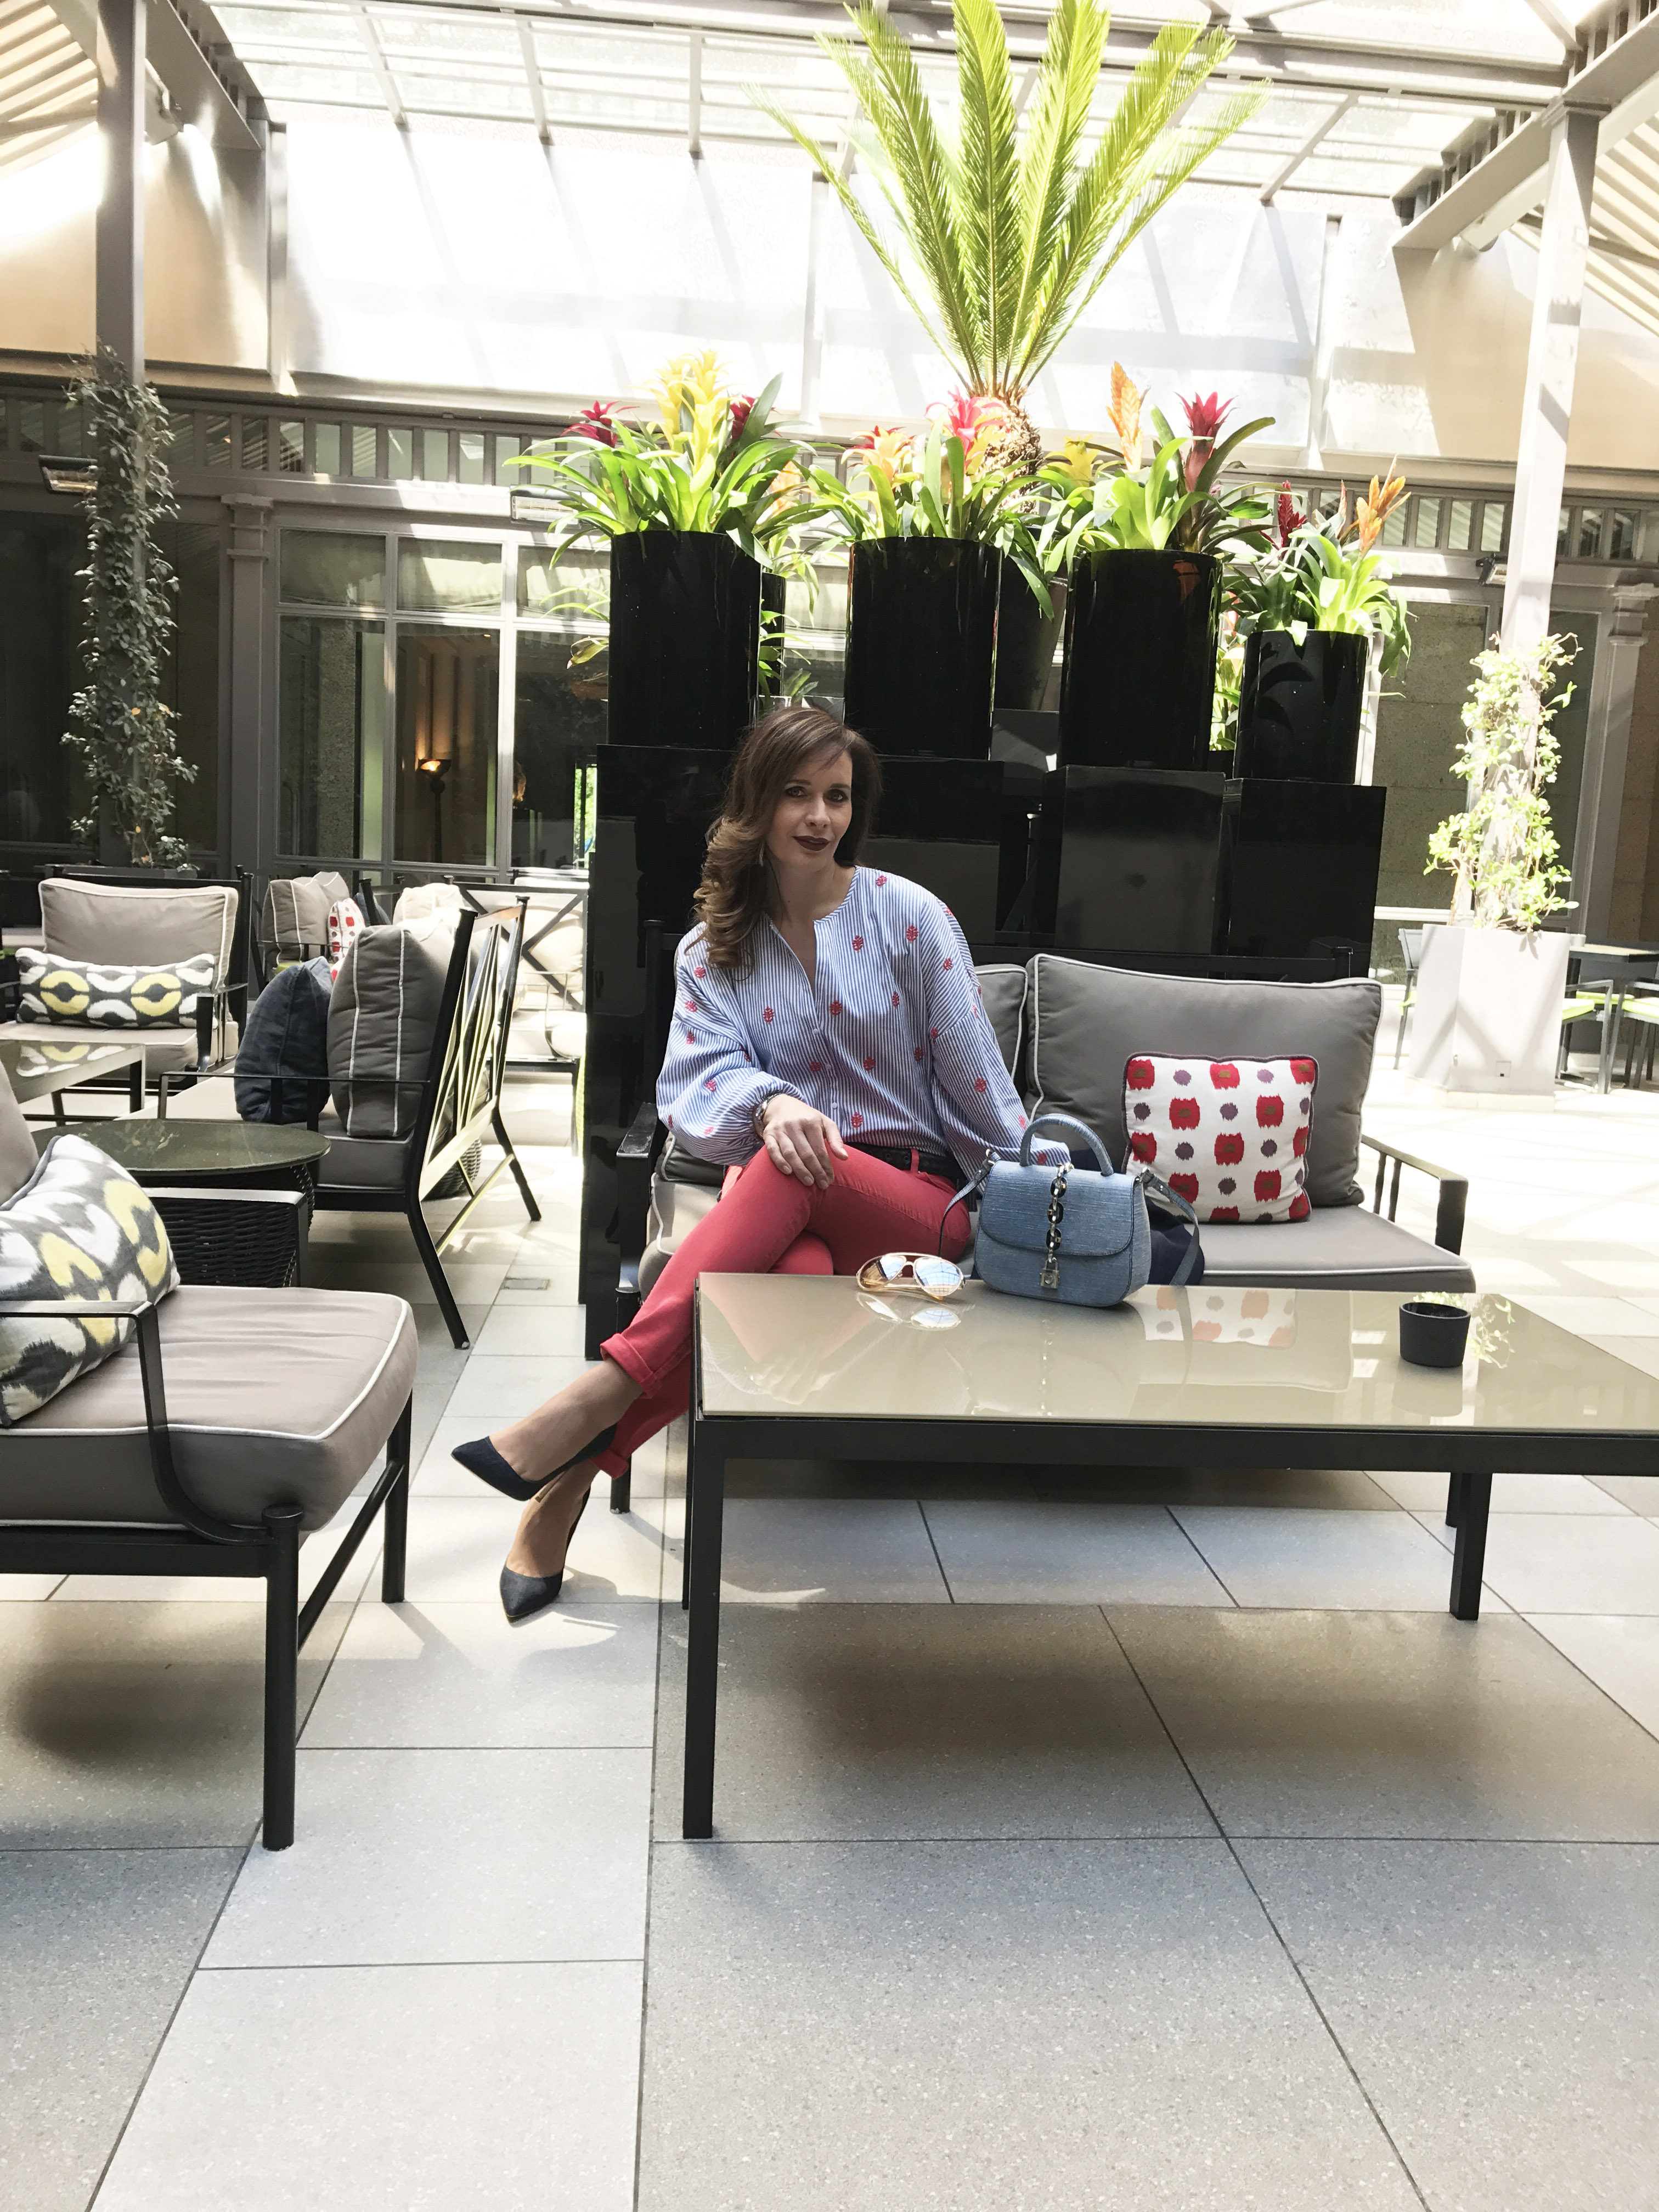 Villa Magna hotel review, Bag Vibes blog